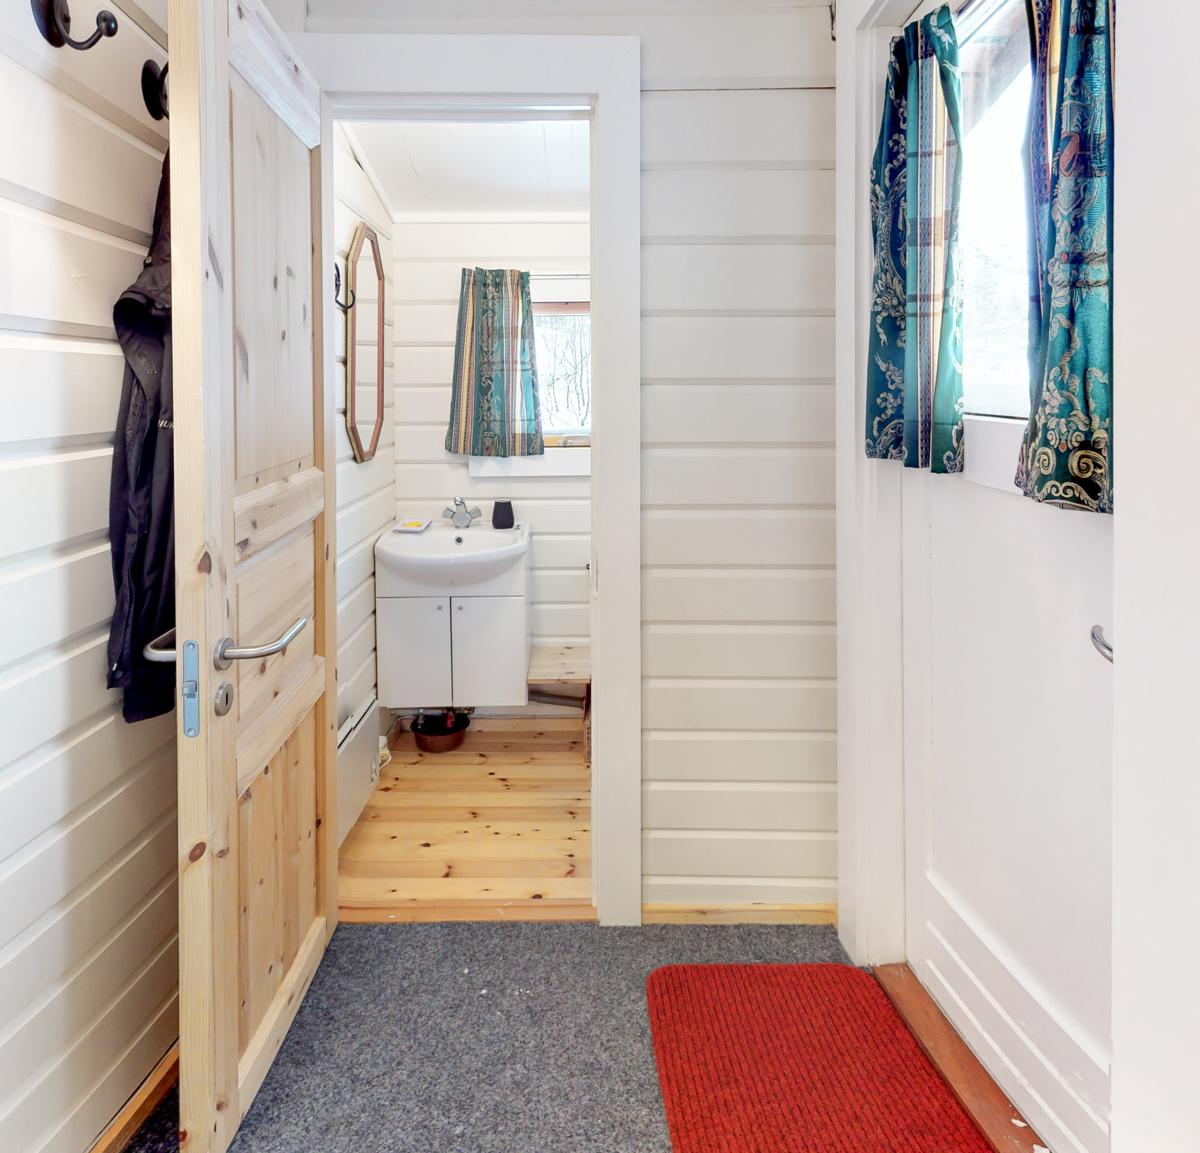 Lyningsane-Hyttegrend-7-Bathroom